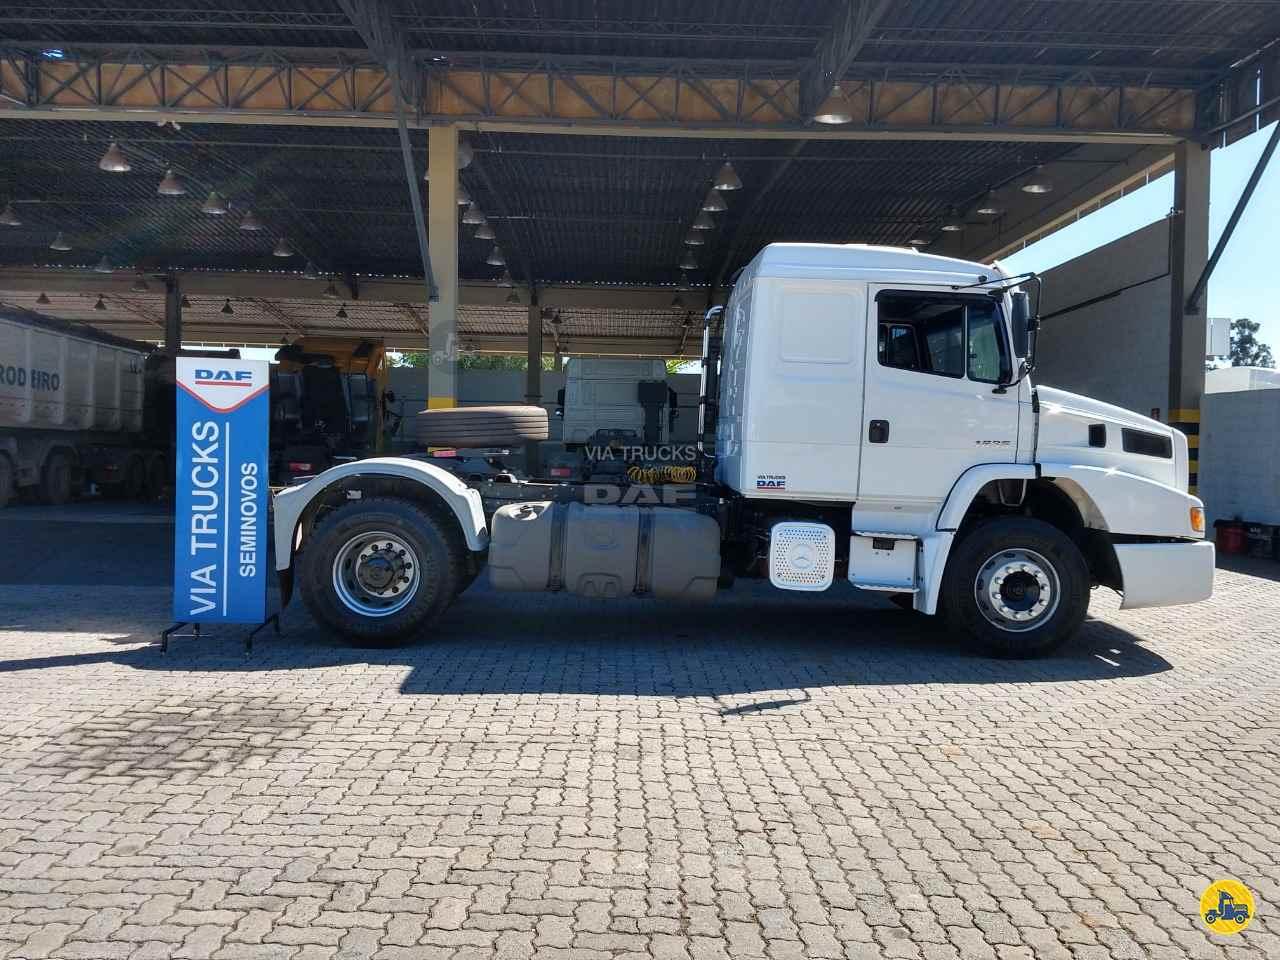 MERCEDES-BENZ MB 1635 250000km 2017/2018 Via Trucks - DAF